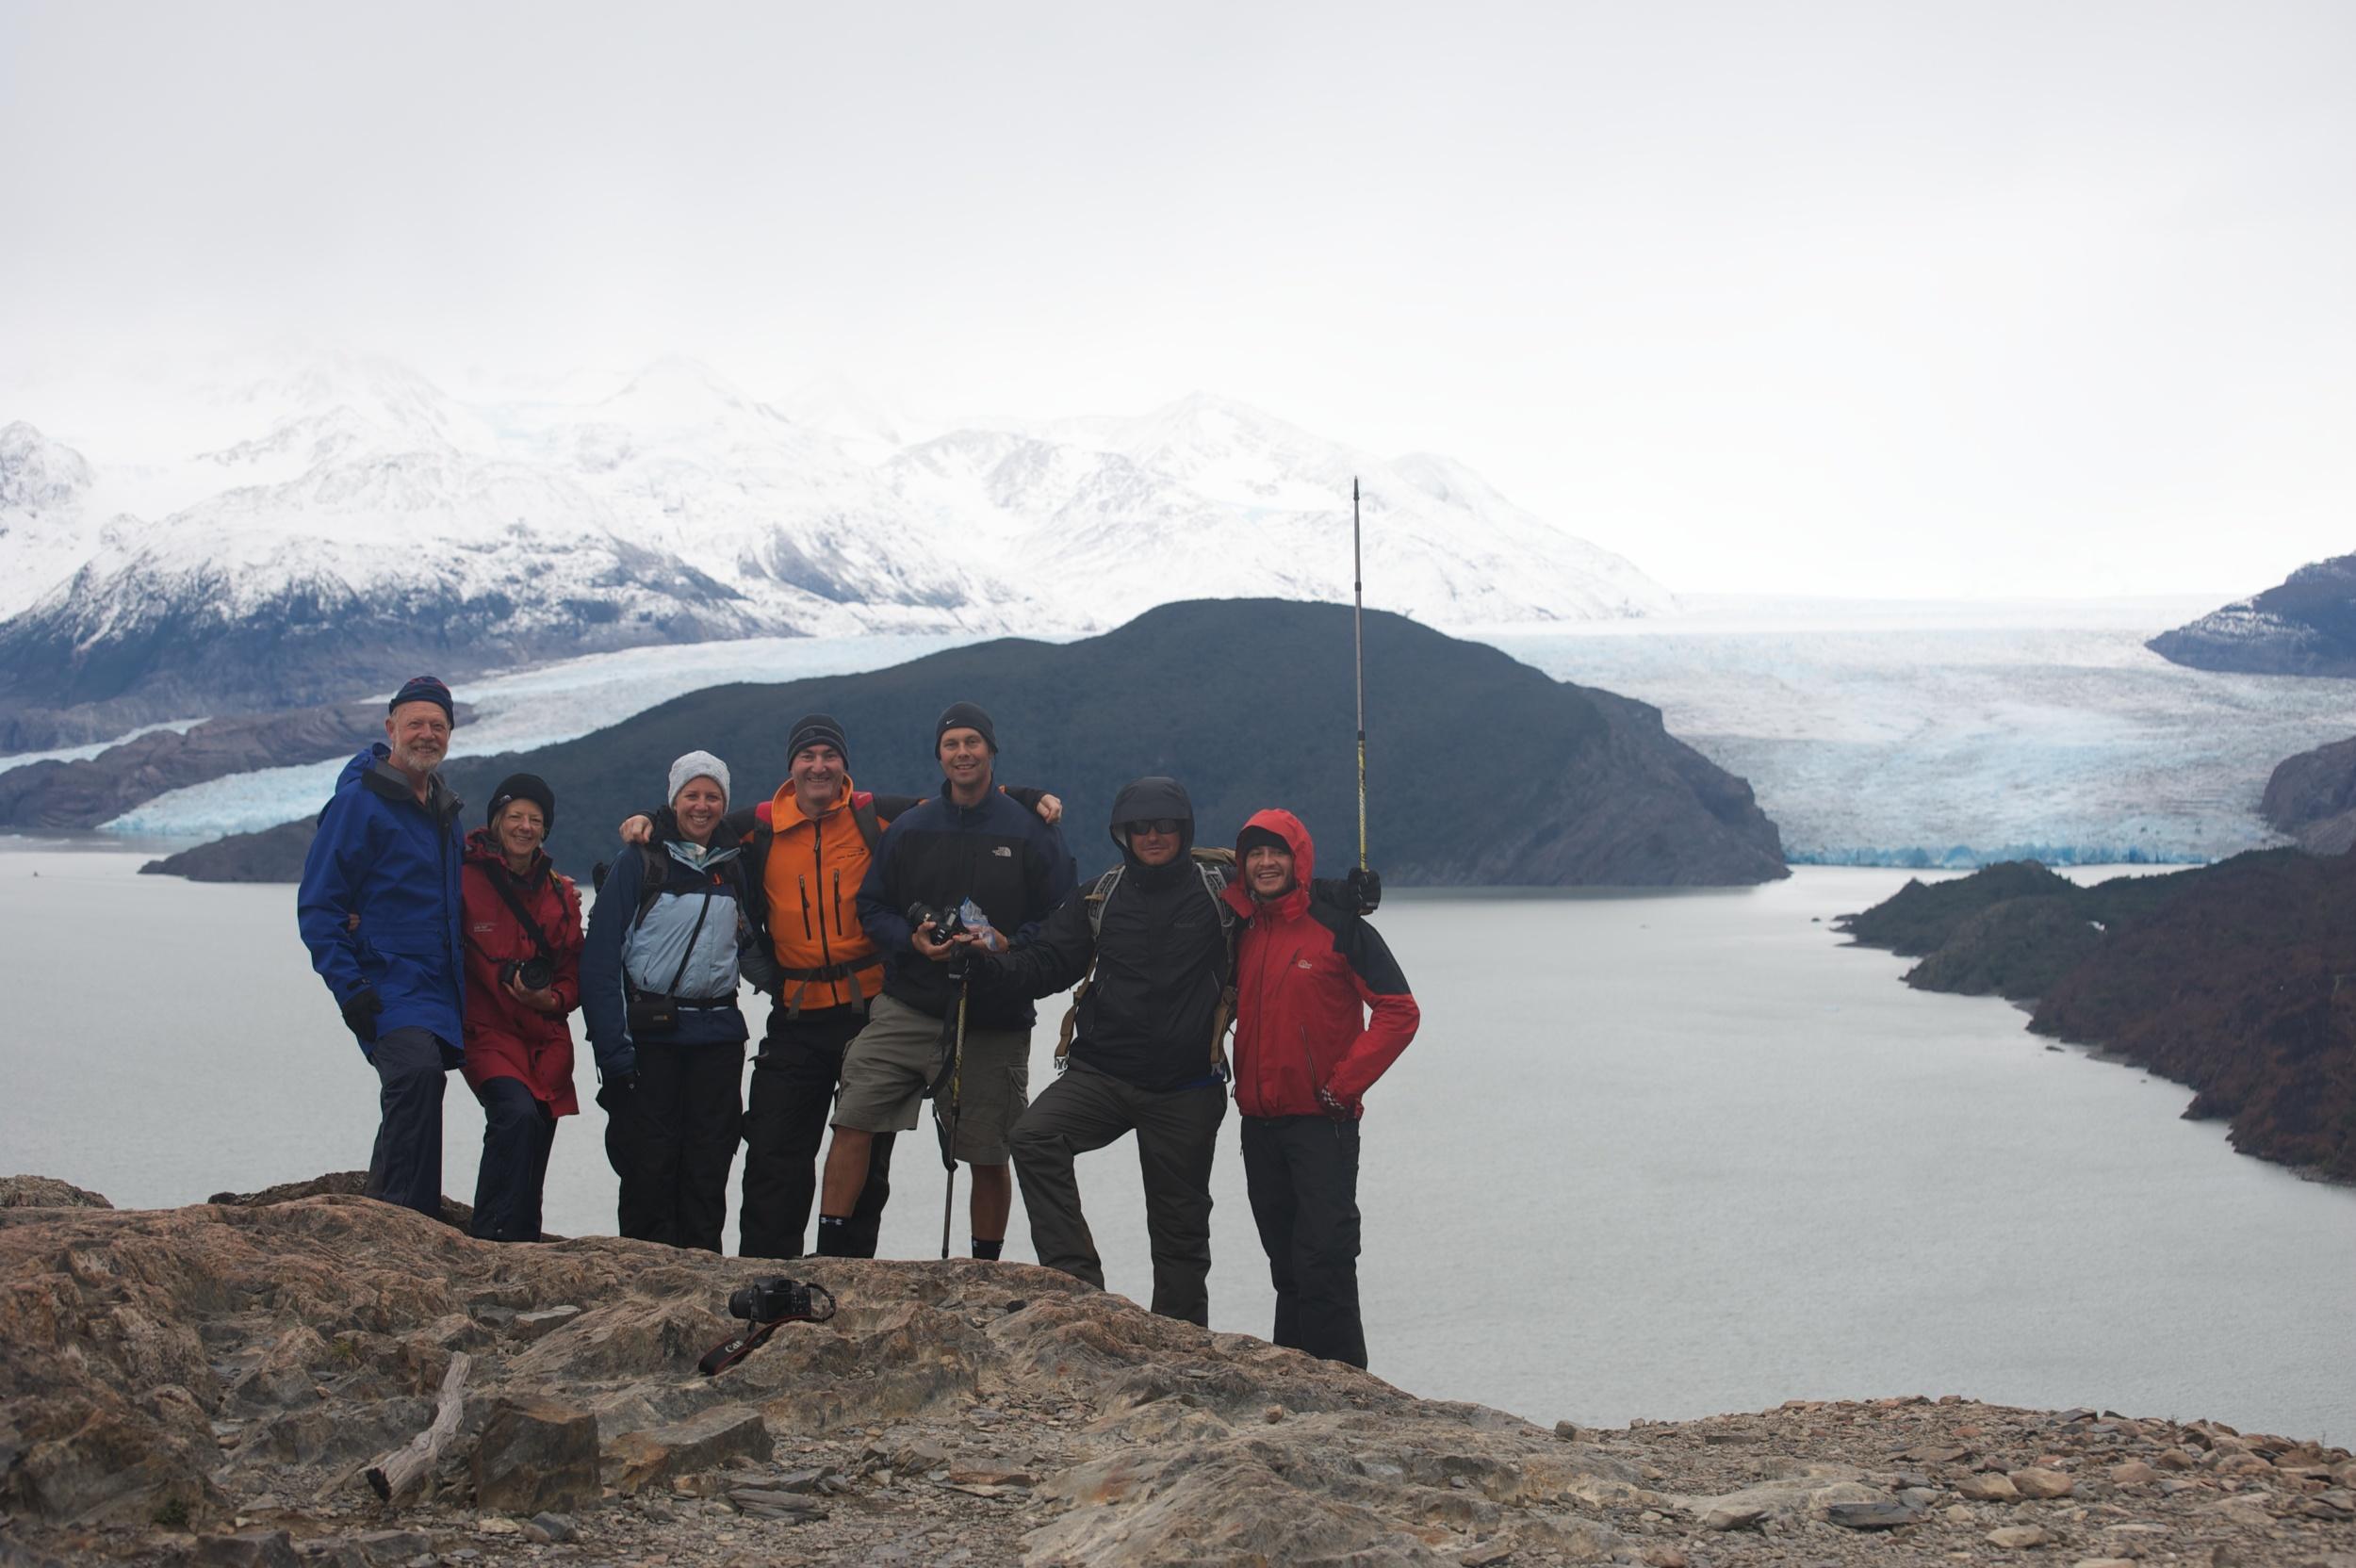 Our tour group at Grey Glacier, Torres del Paine, Patagonia, Chile, 6 Apr 2012